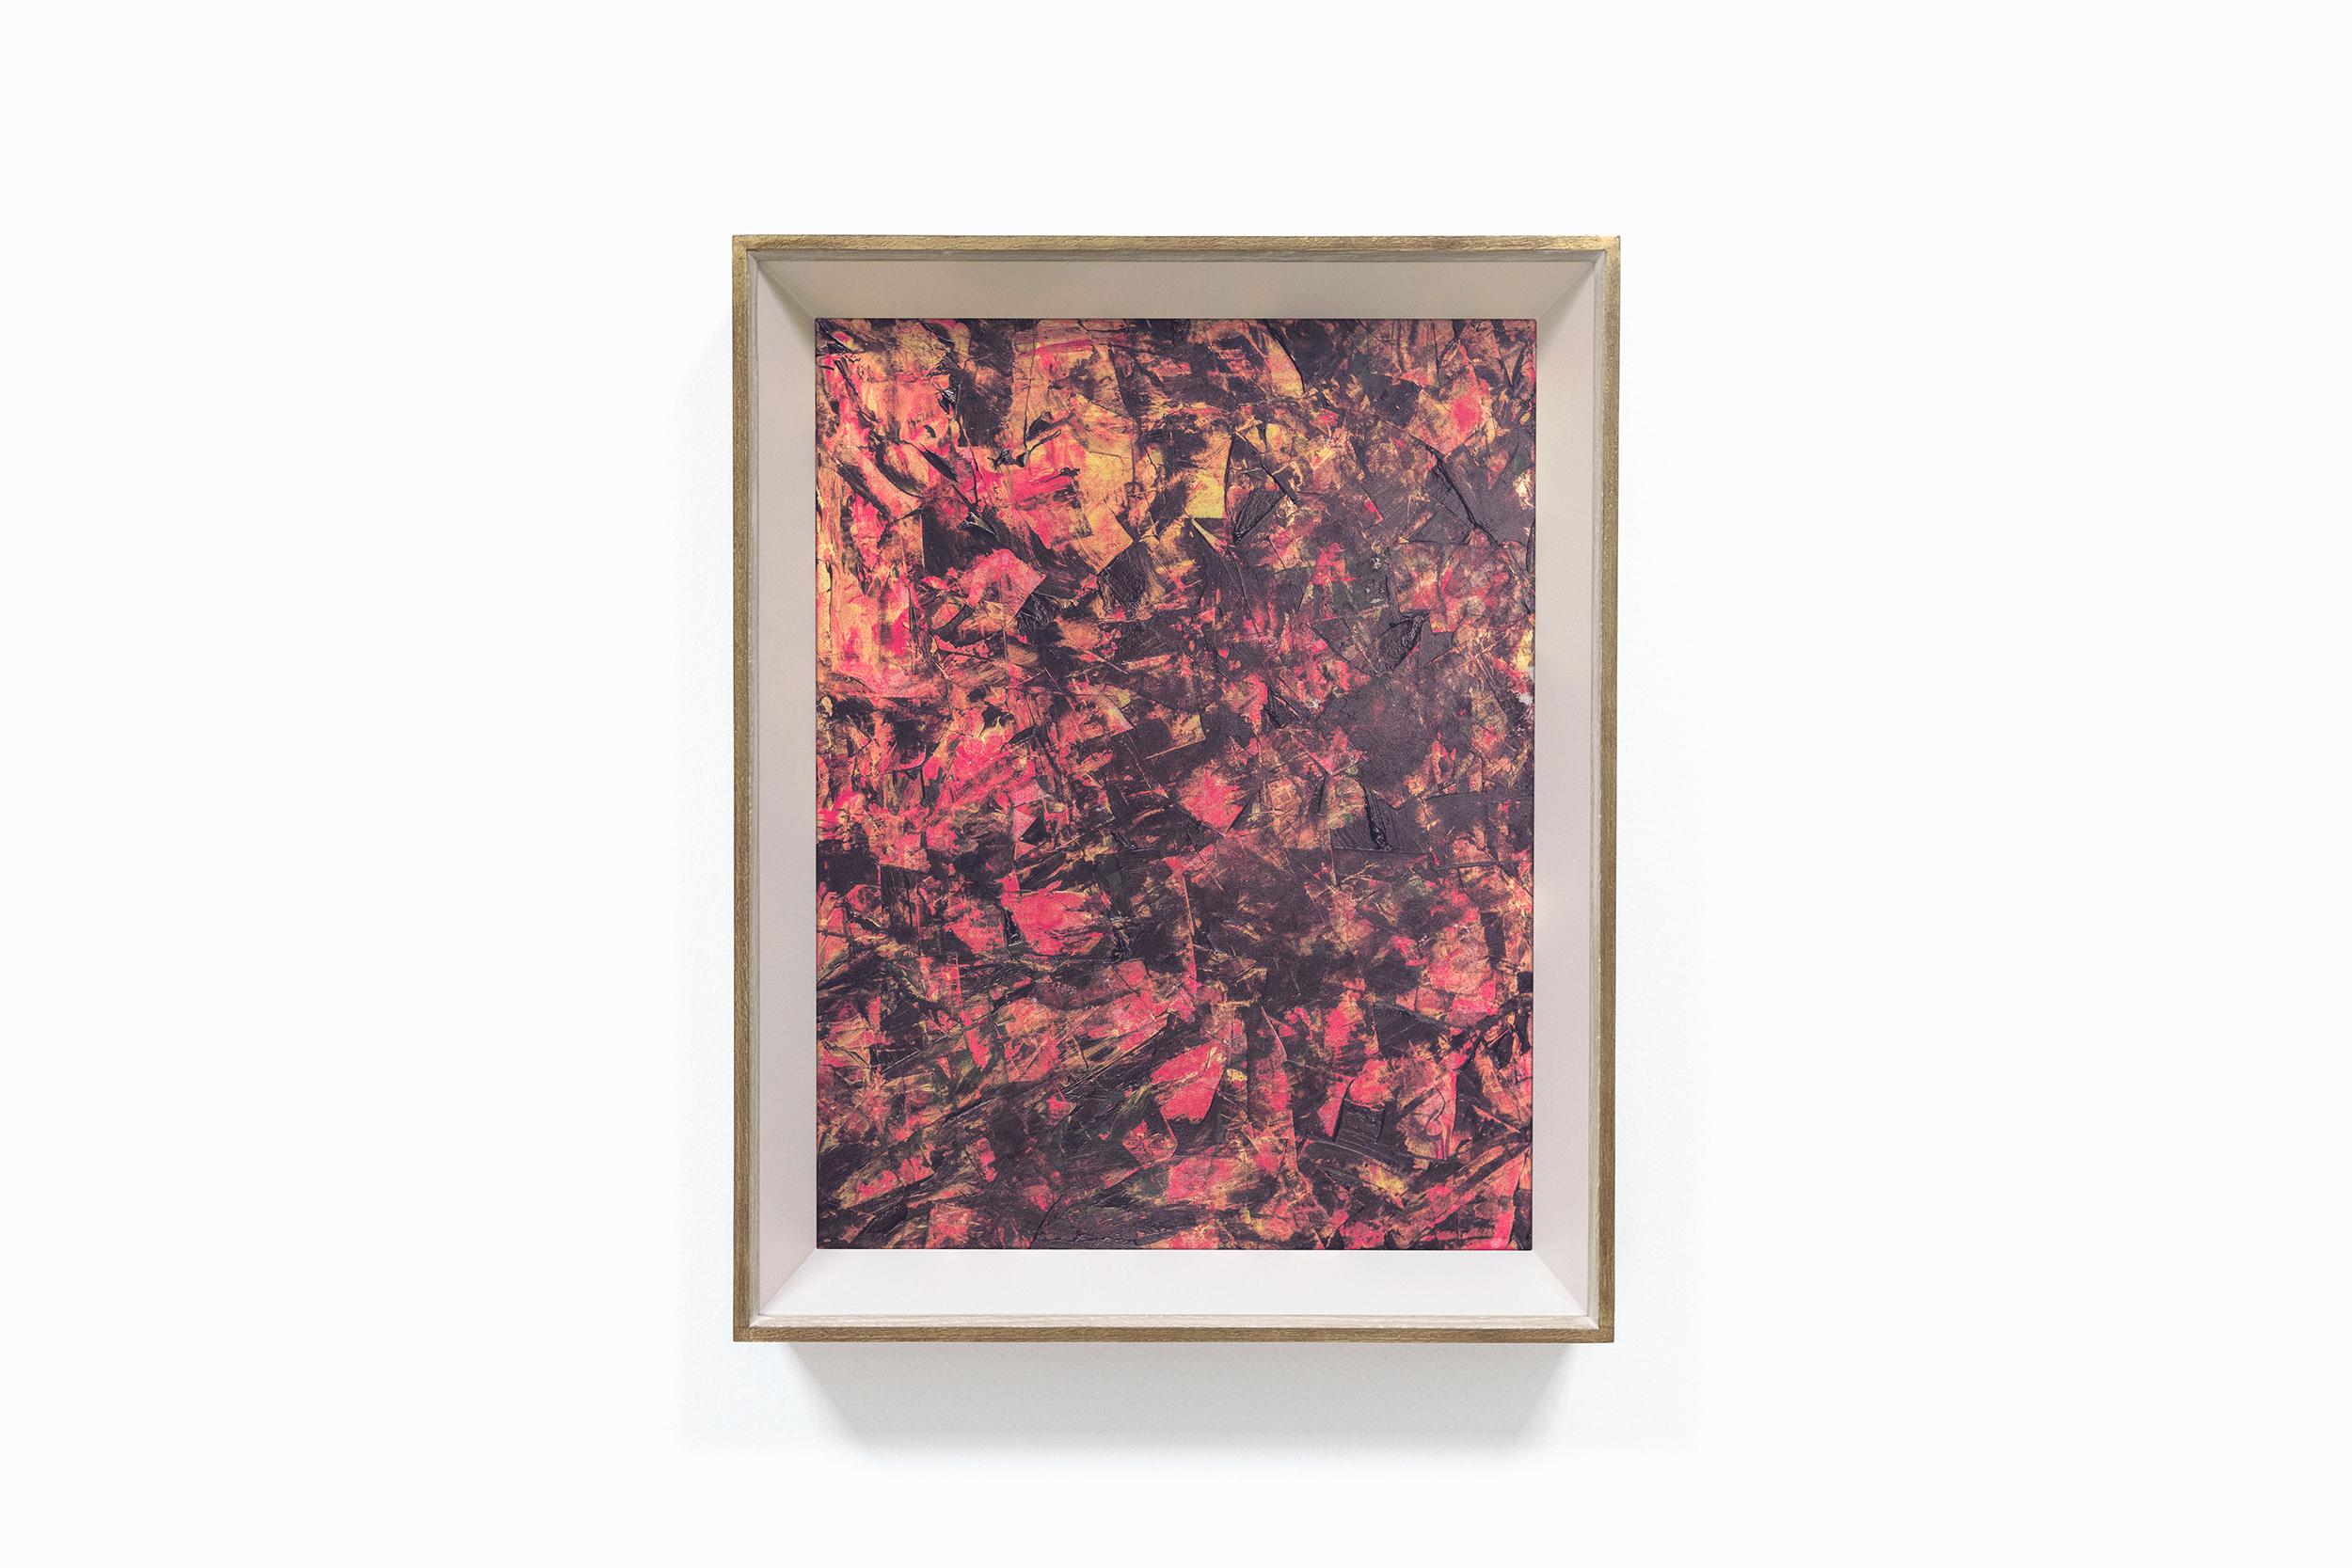 bonjourmolotov+Saudade+Illustration+Ilustracao+painting+pintura+acrylic+acrílico+canvas+tela+paper+cardboard+mdf+Andre+Gigante+01.jpg